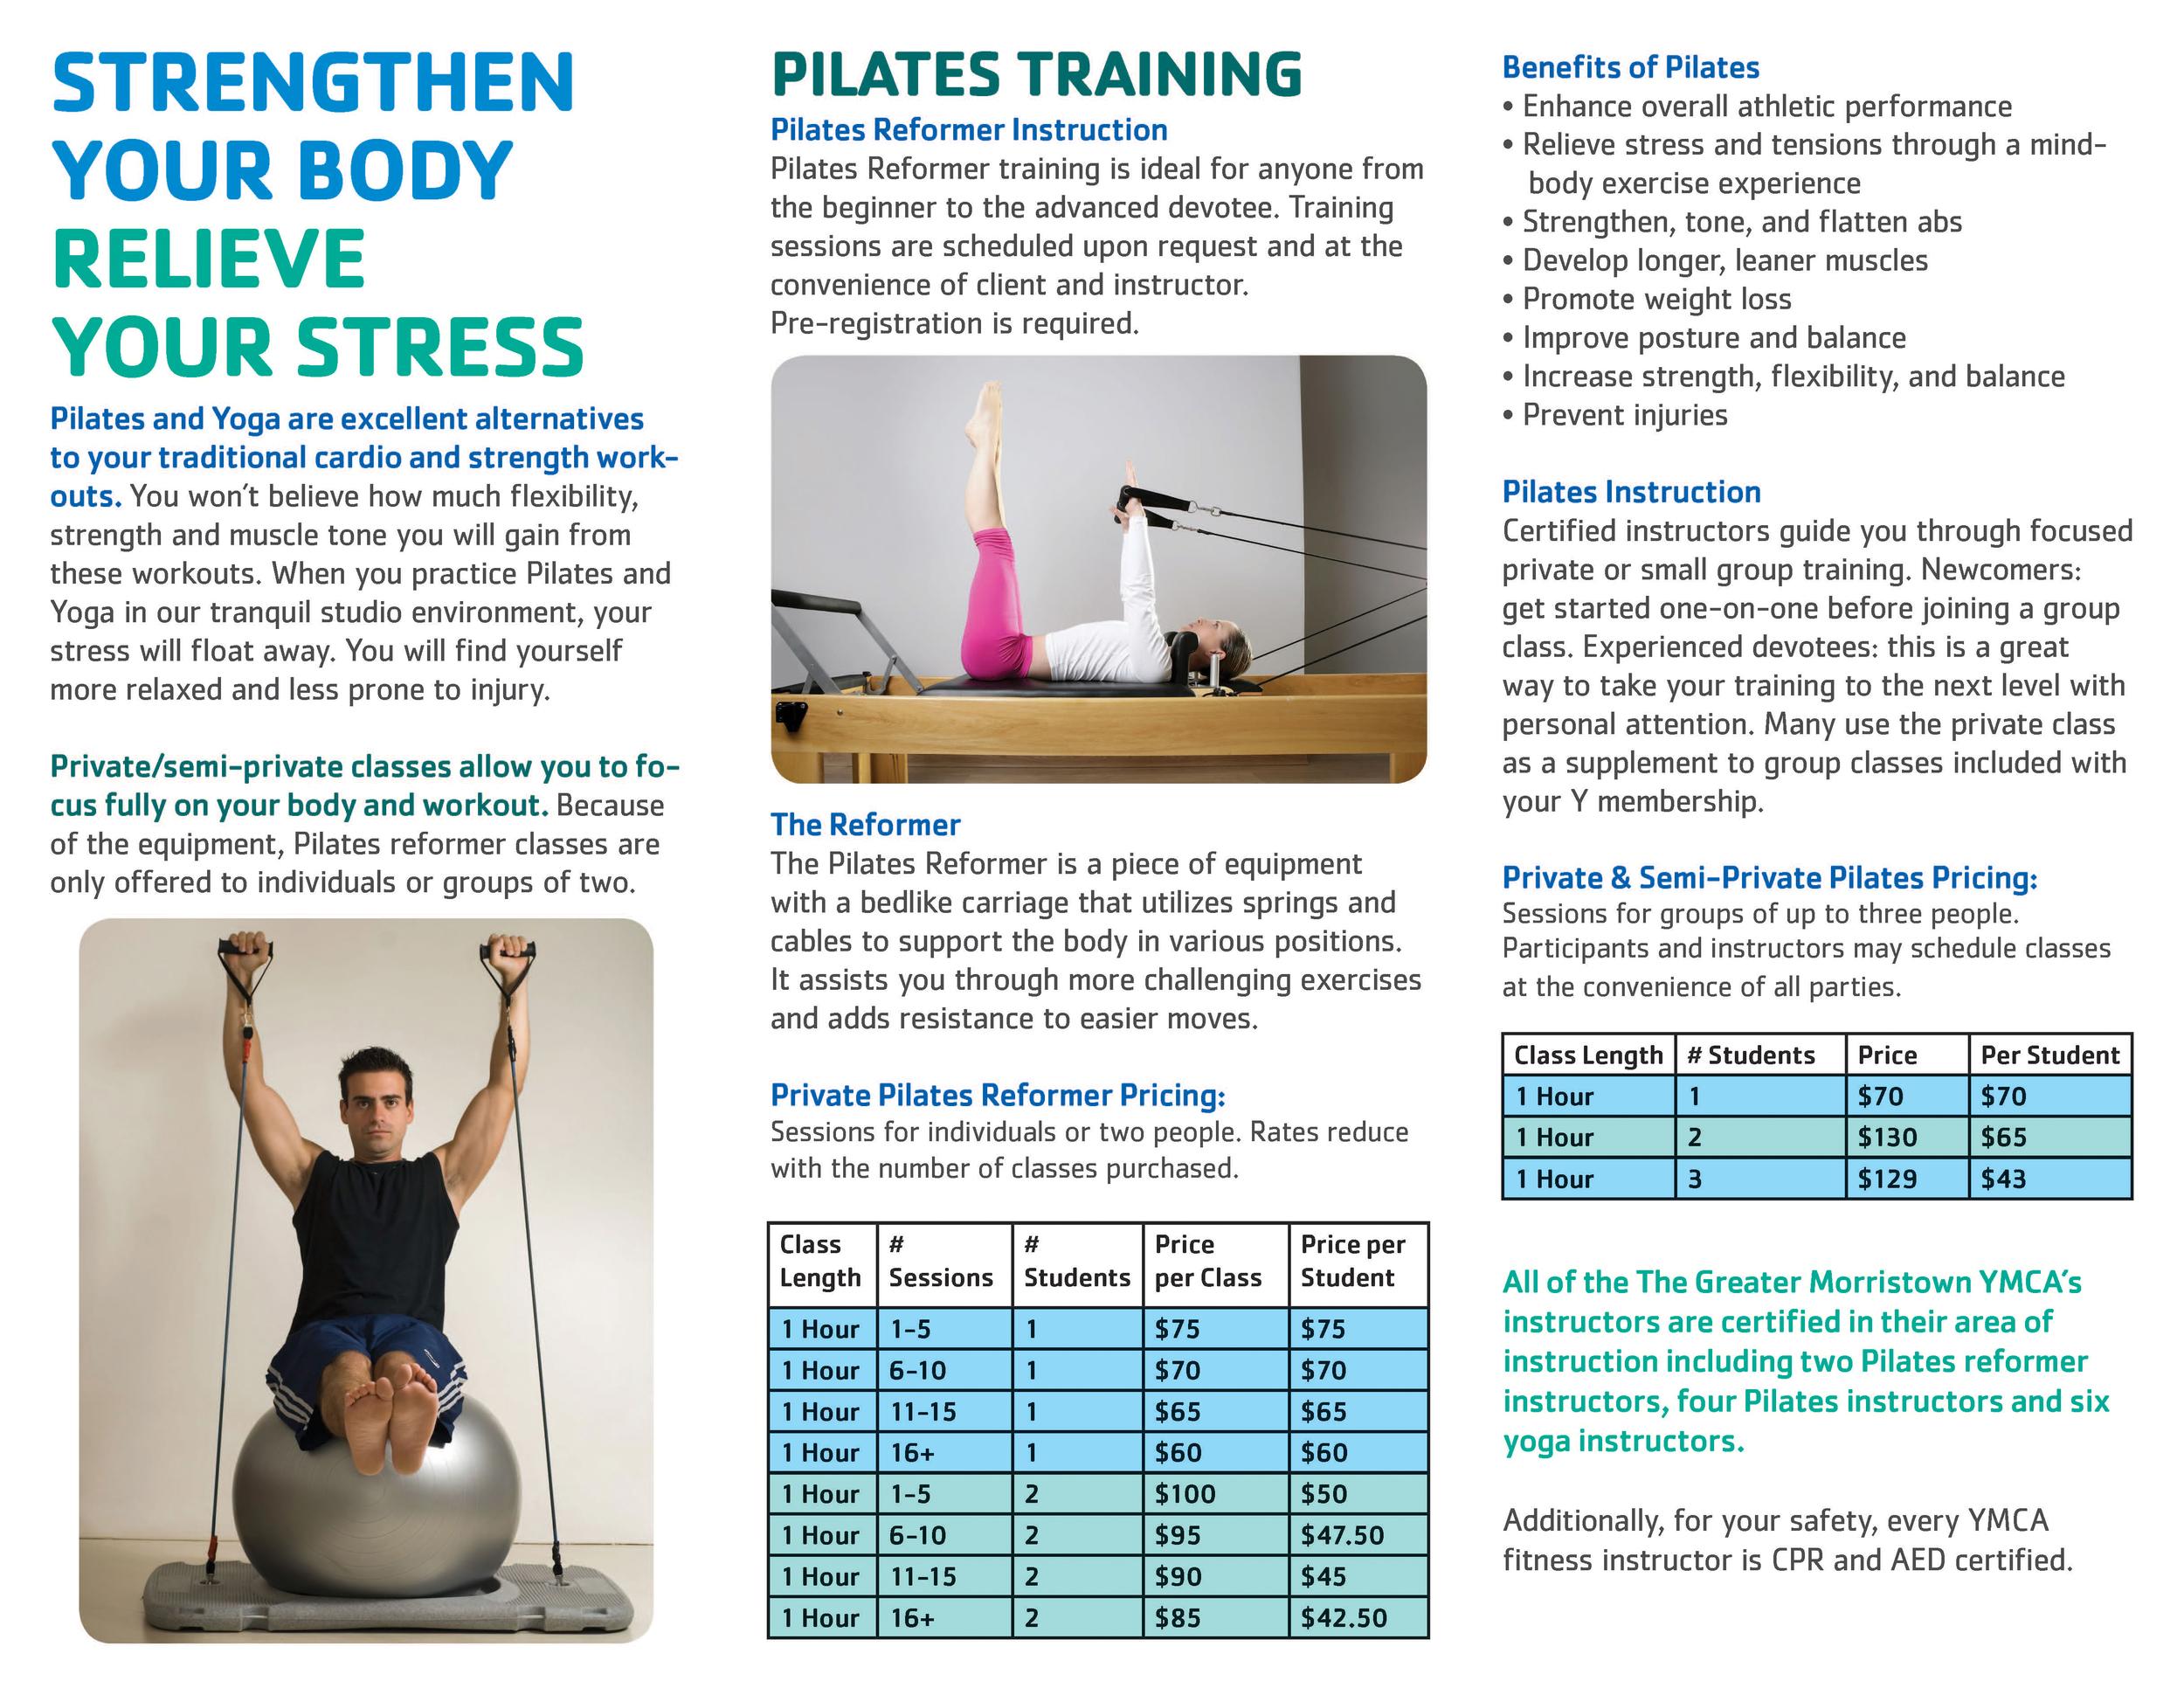 GMYMCA_Pilates_Brochure_Page_2.jpg